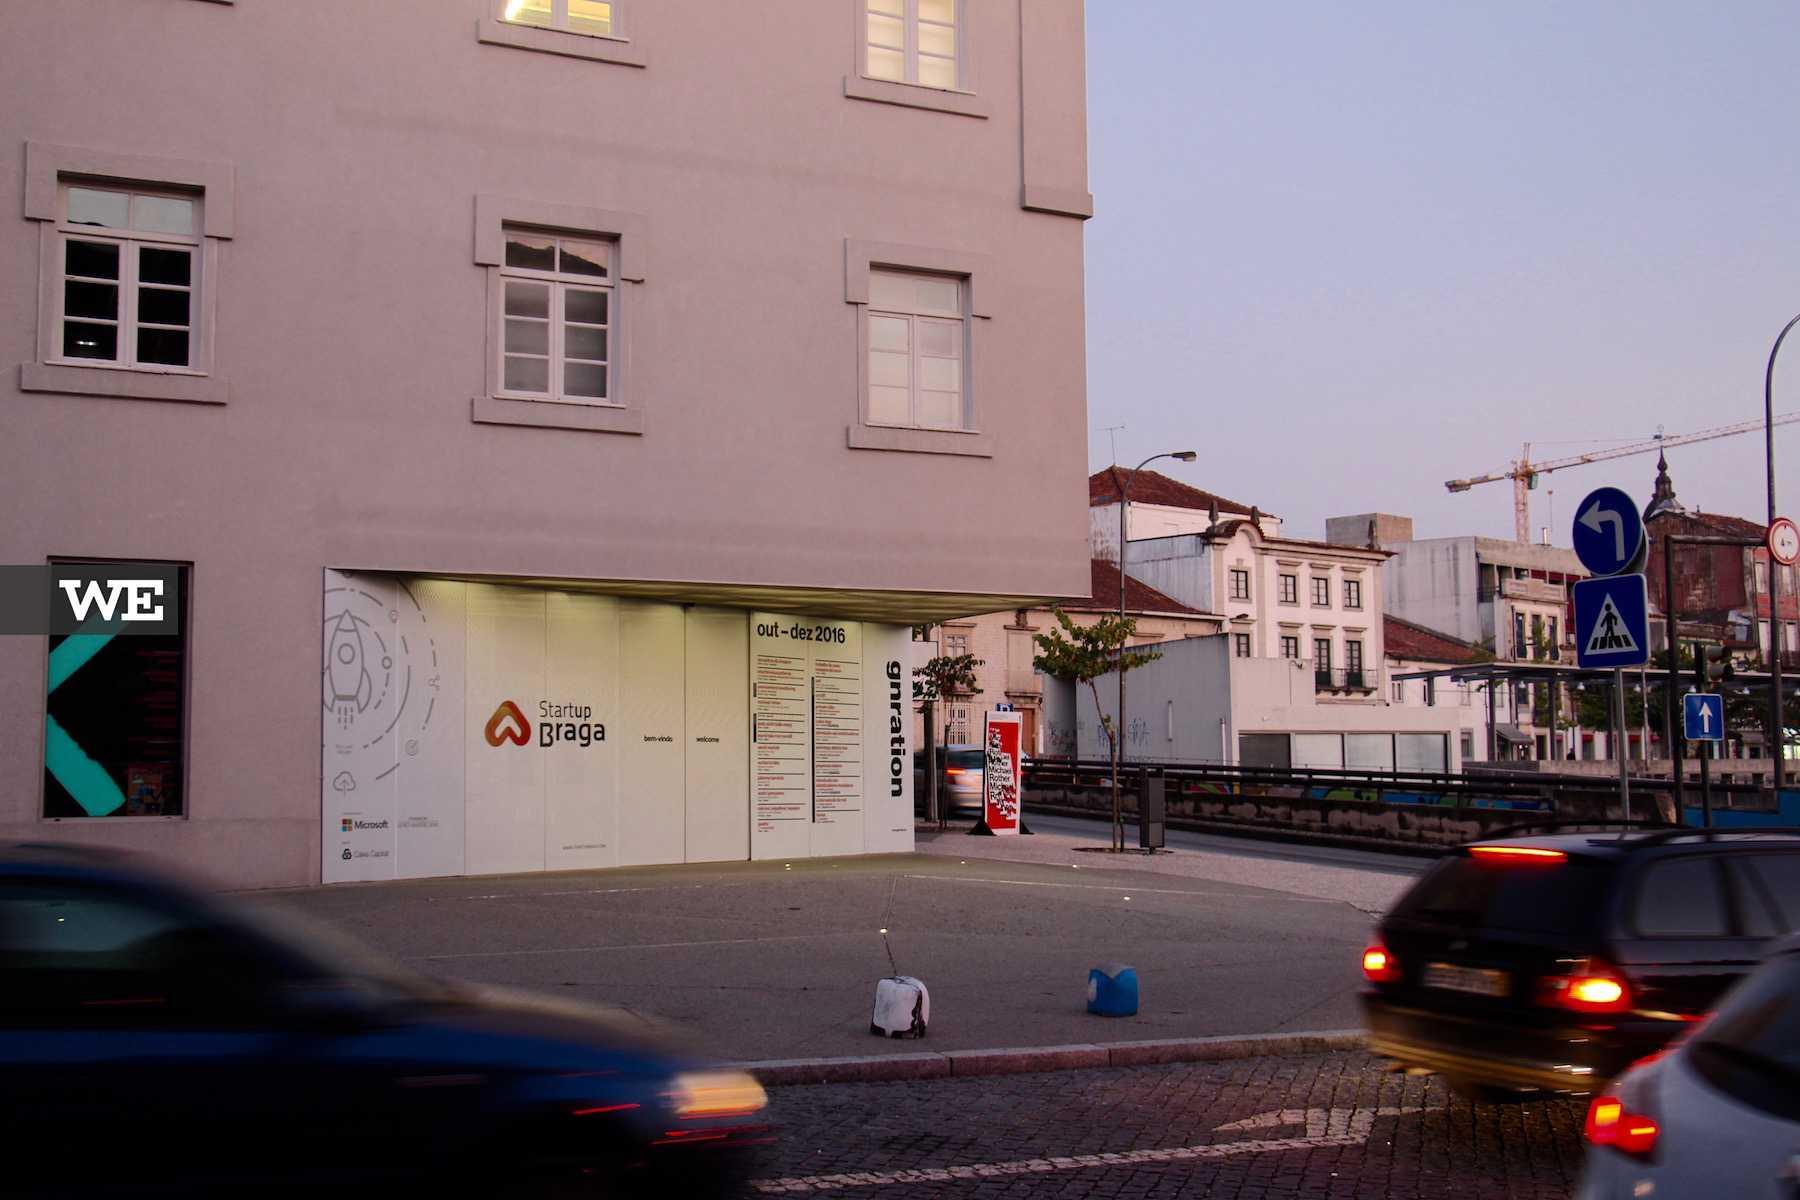 GNRation, Braga